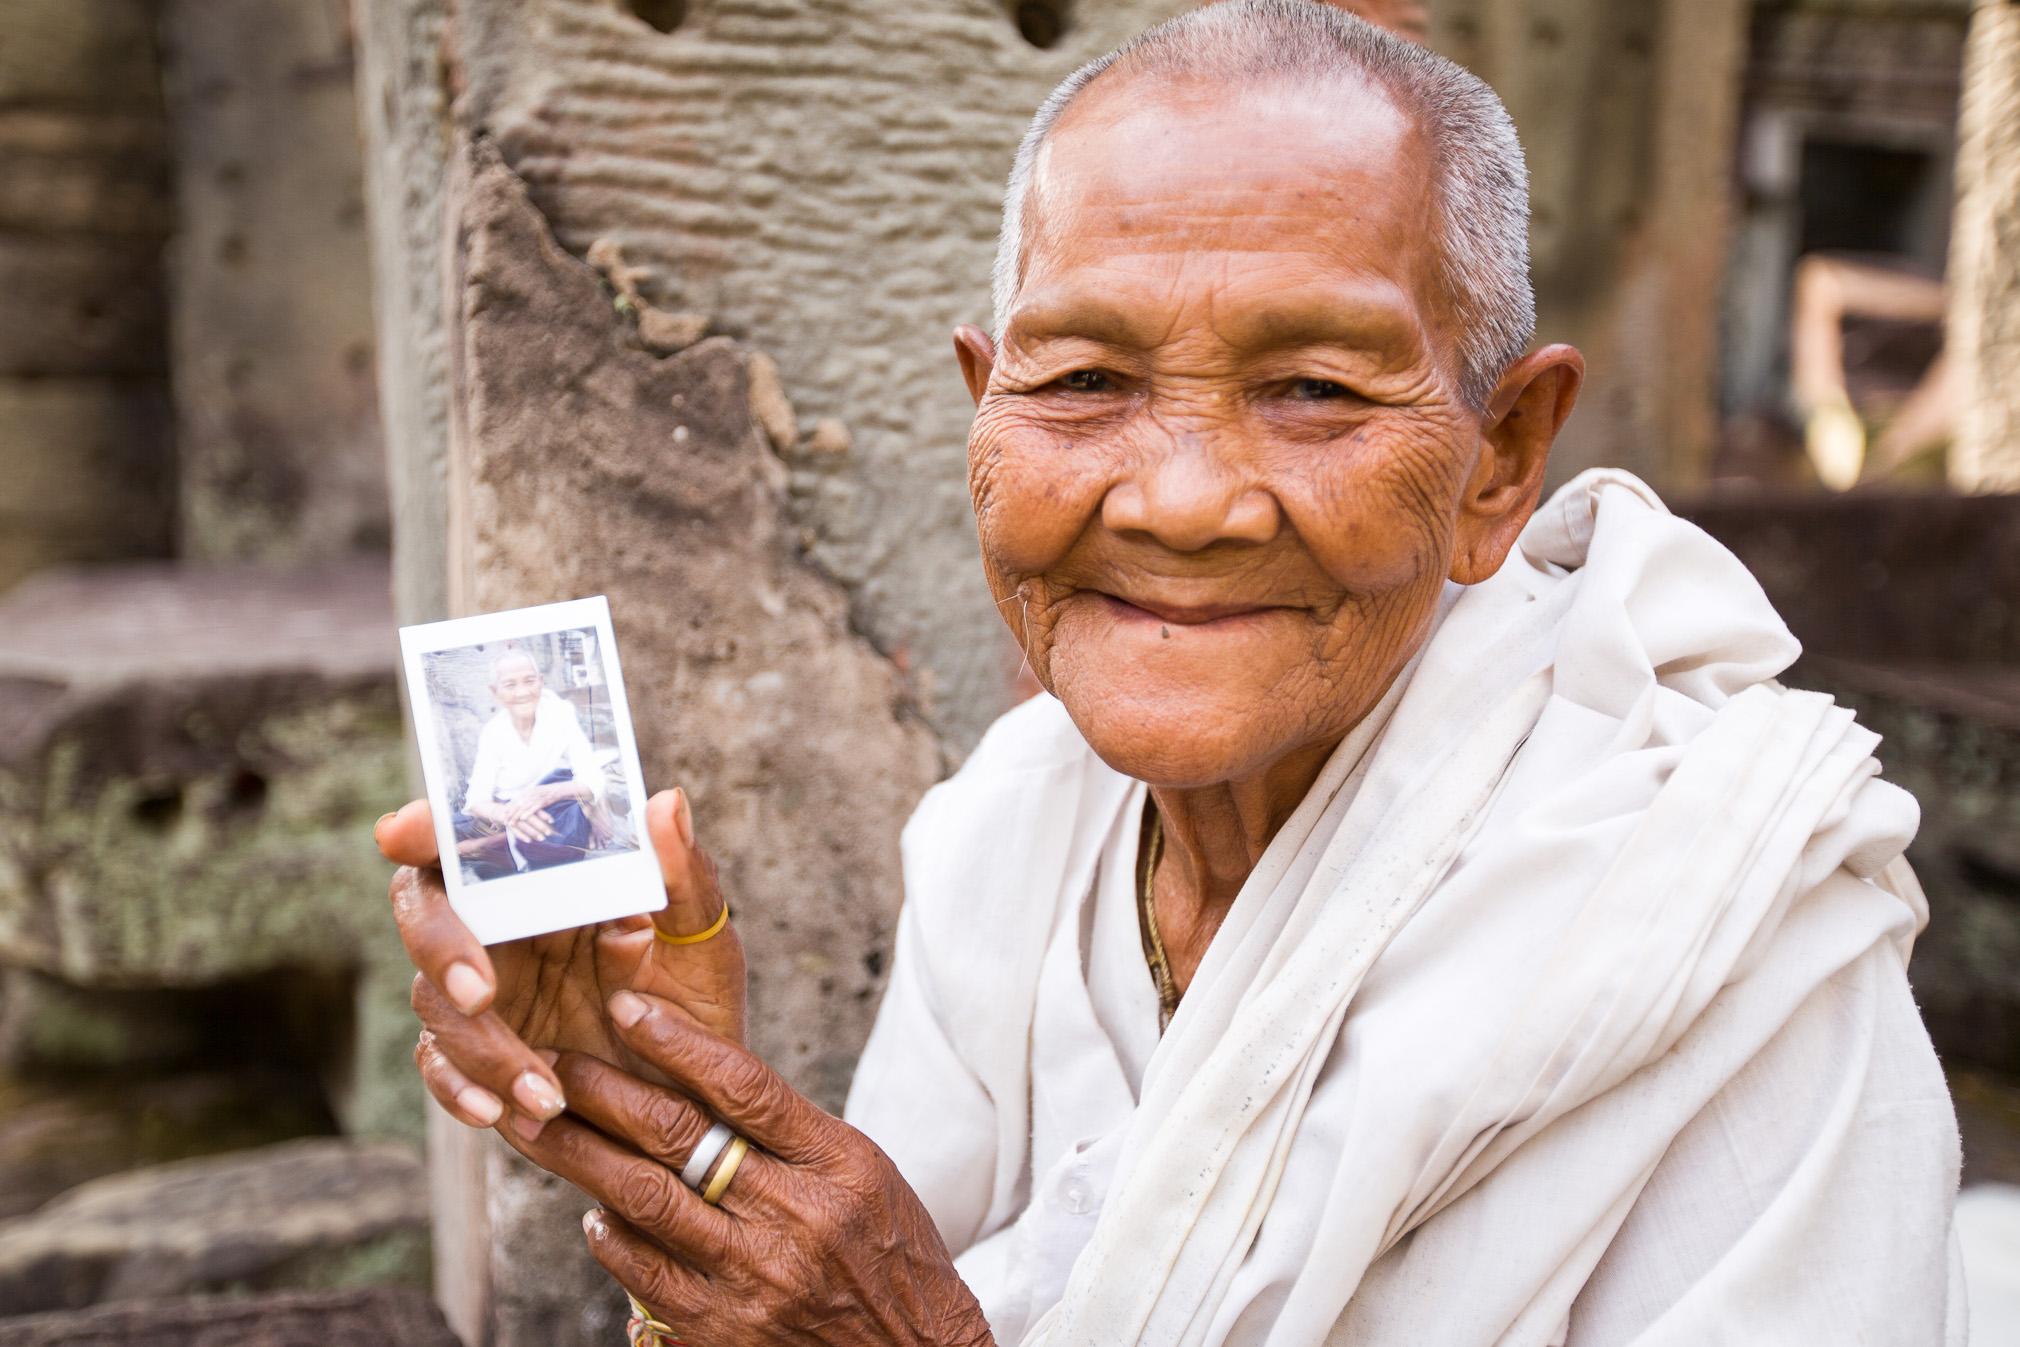 120417-075800-Cambodia-Angkor-Gavin-Gough.jpg